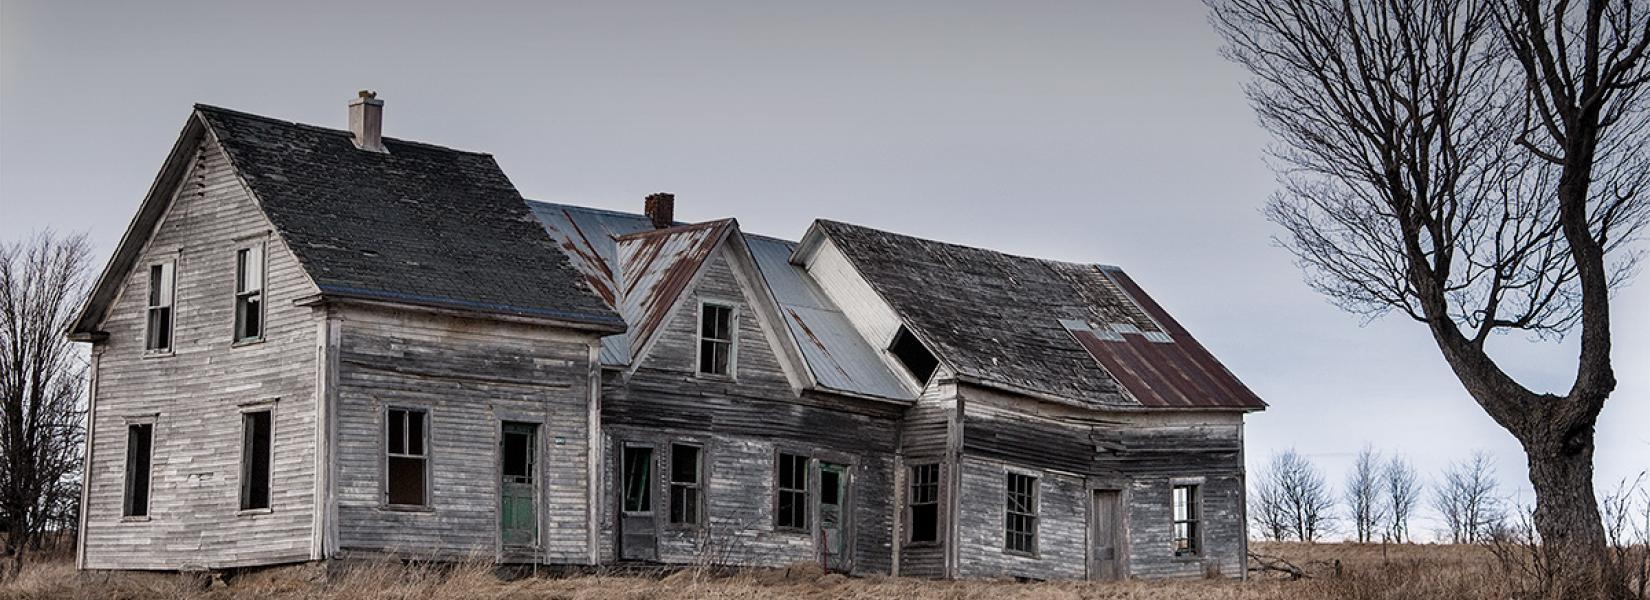 Abandoned house - Scotstown area | Photo by Jarold Dumouchel